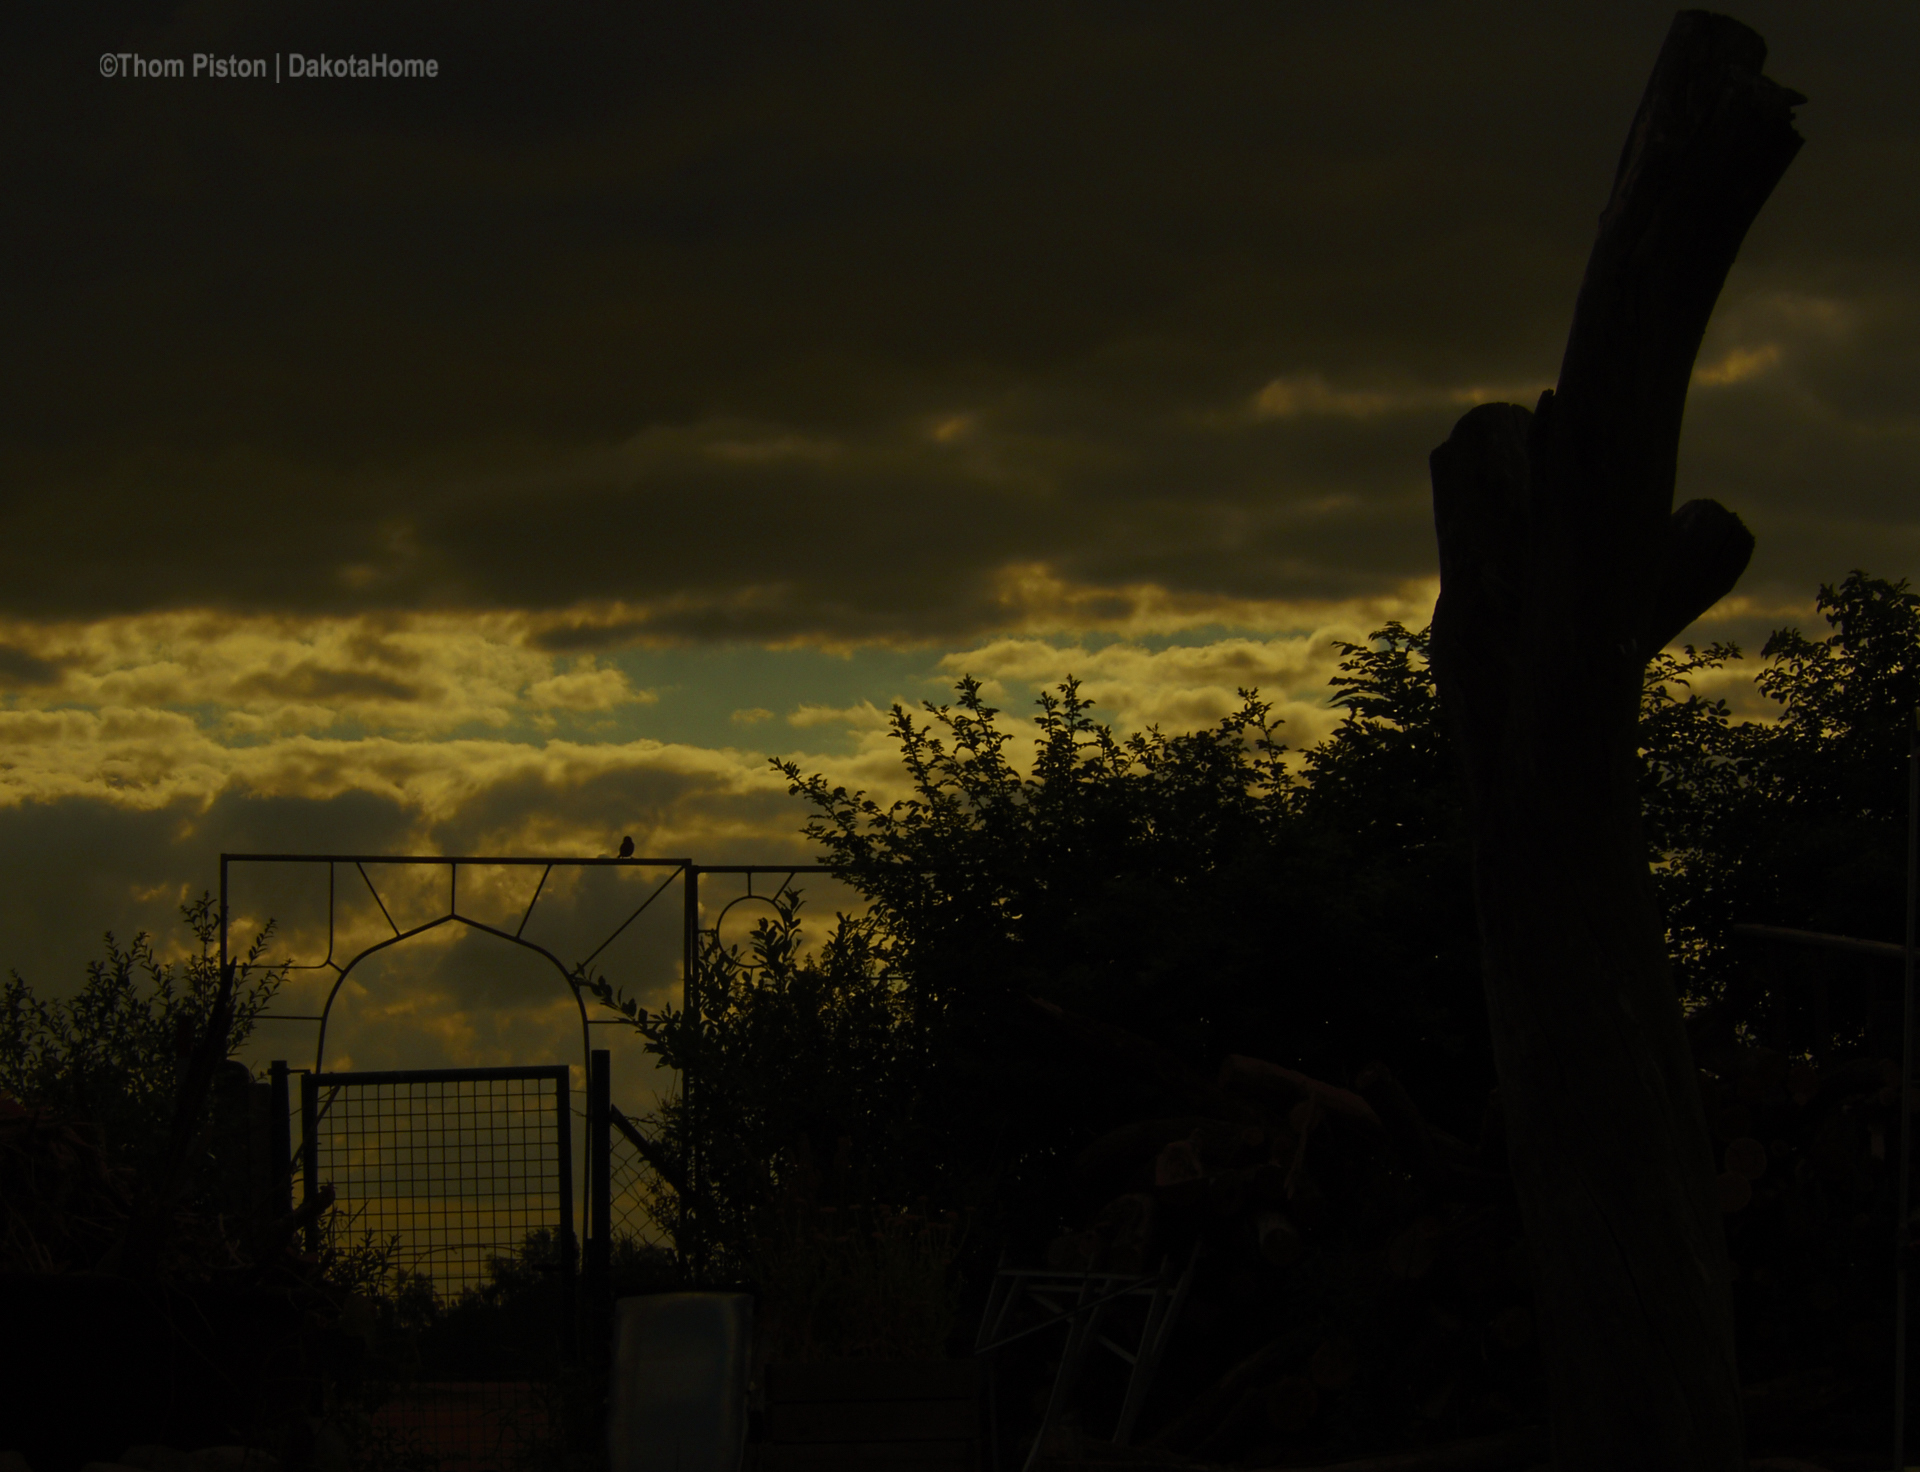 Sonnenuntergänge at Dakota Home..